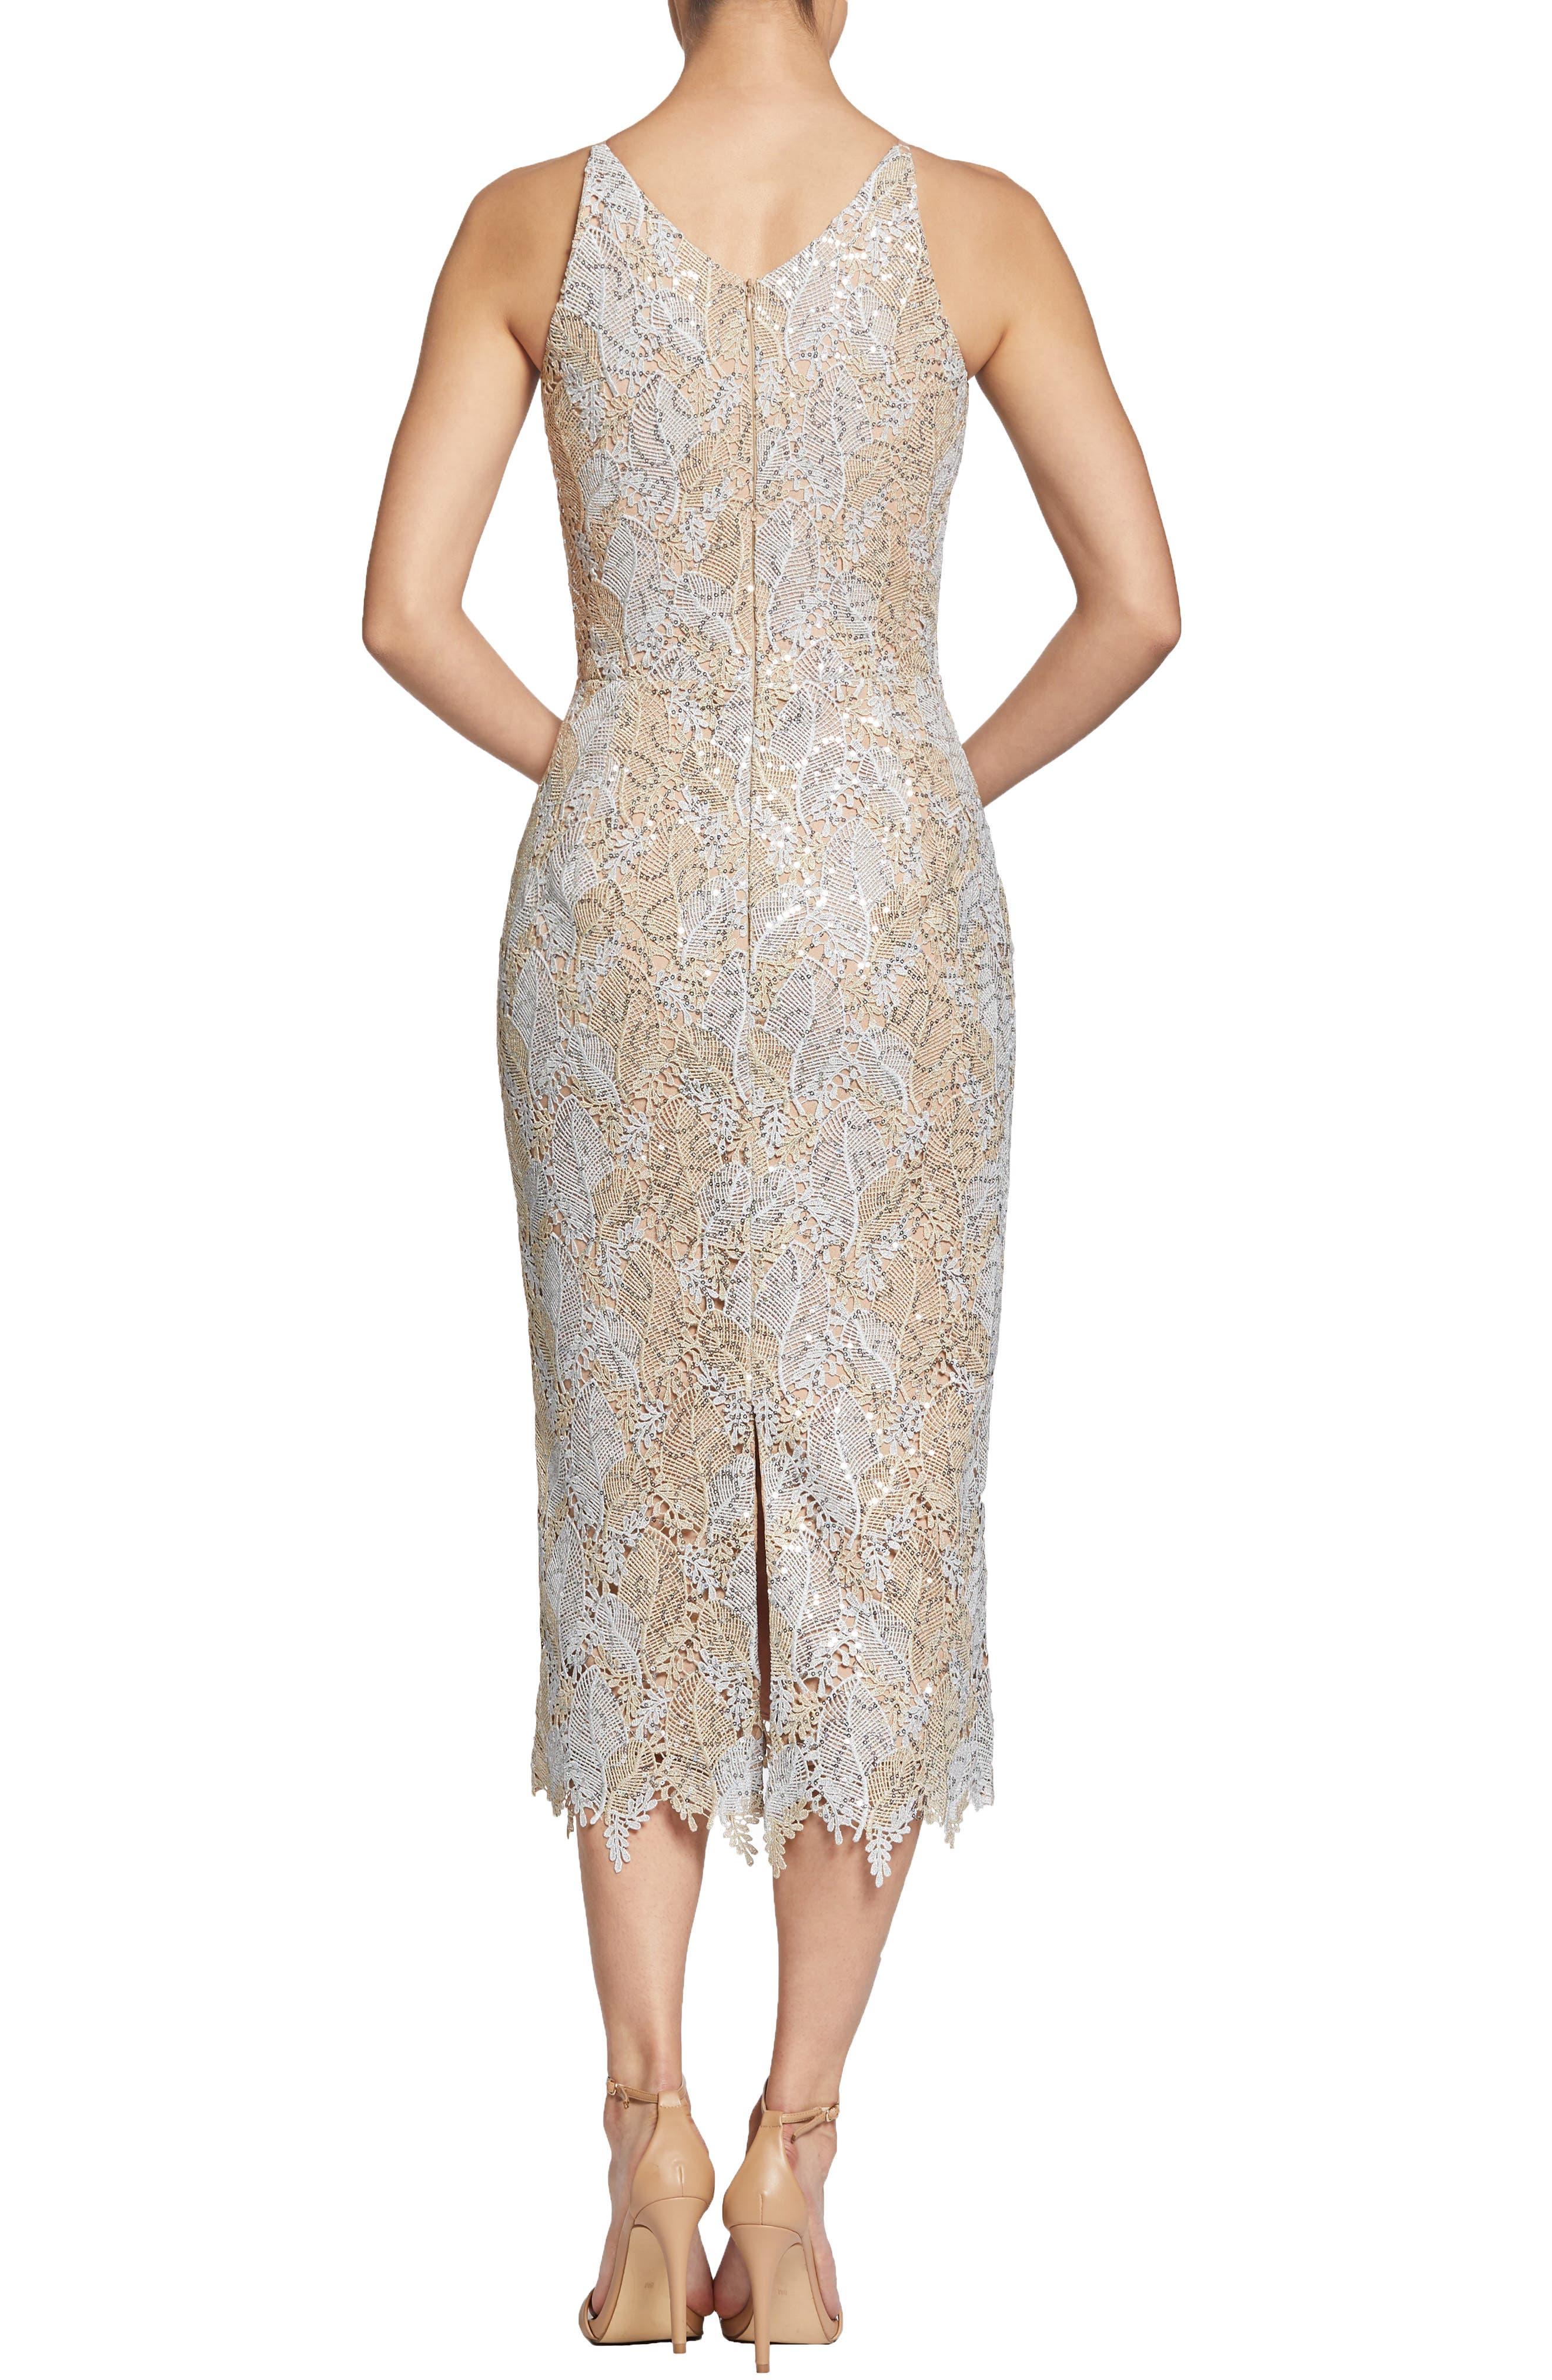 Aurora Lace Sheath Dress,                             Alternate thumbnail 2, color,                             PLATINUM/ GOLD